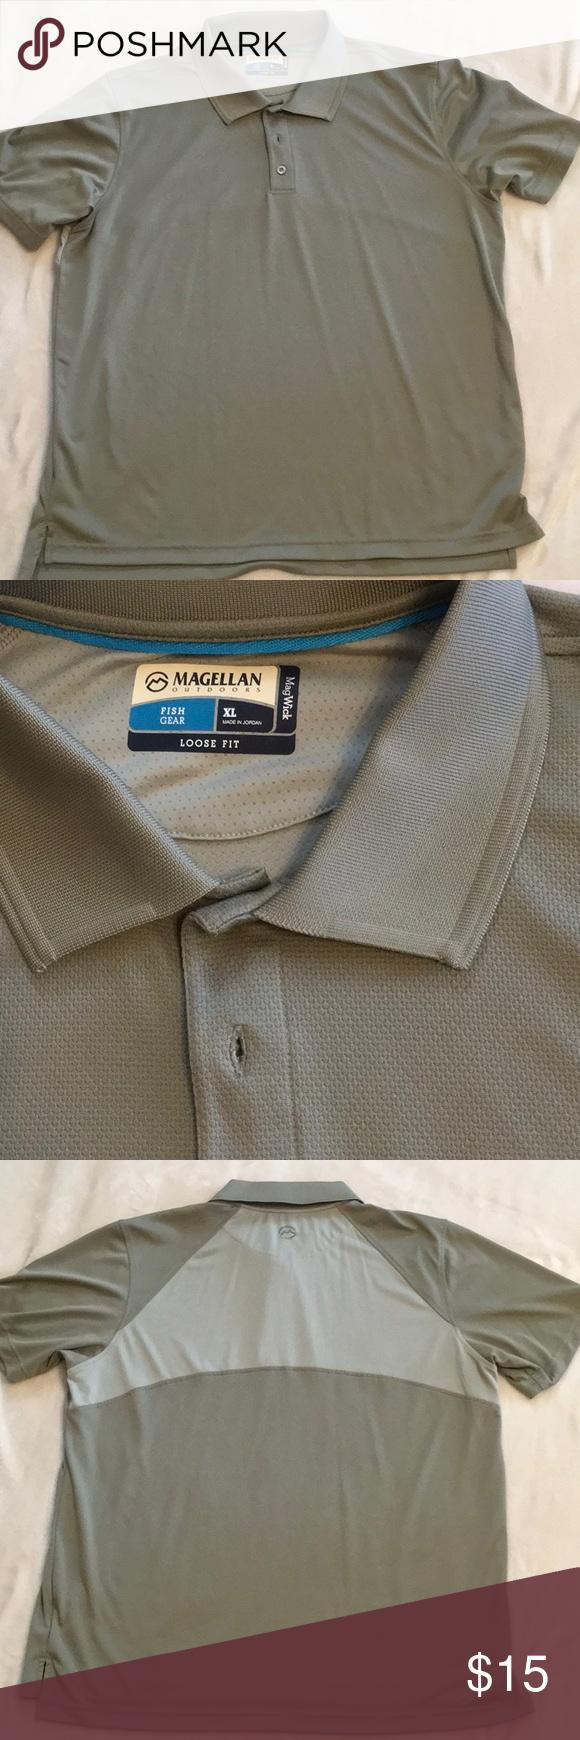 3c937d12 Magellan Outdoors Men's Laguna Polo Shirt NEW. XL. Short sleeves 3-button  placket